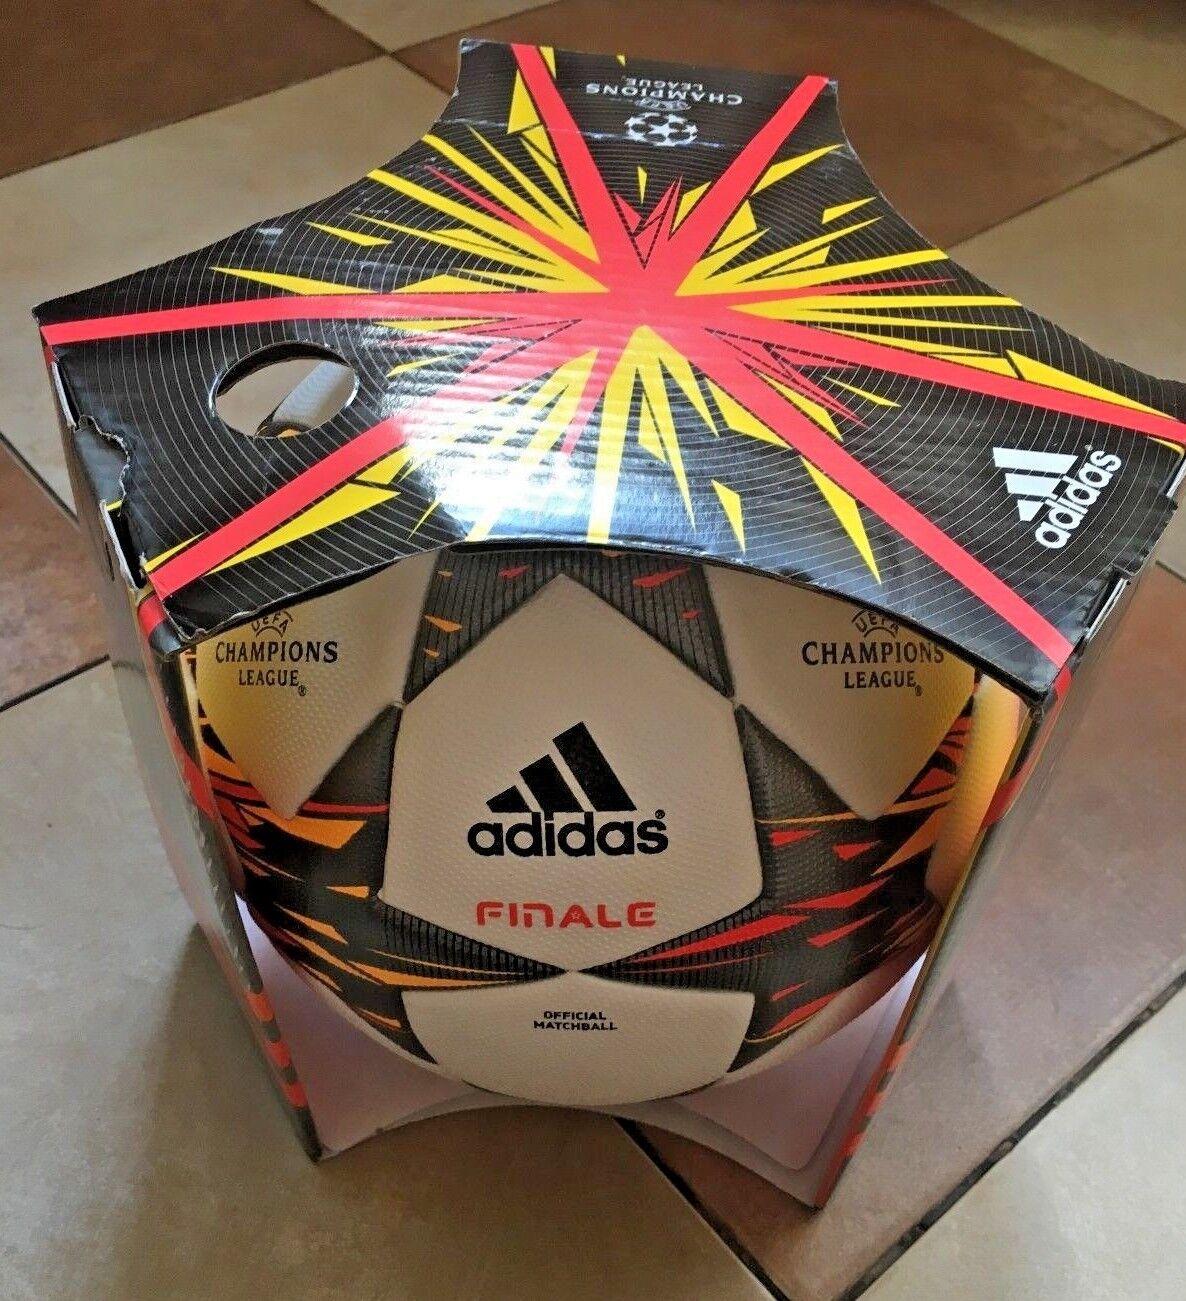 Adidas Matchball Finale 14 14 14 Champions League 2014-2015 OMB F93366. Spielball 96bcb0